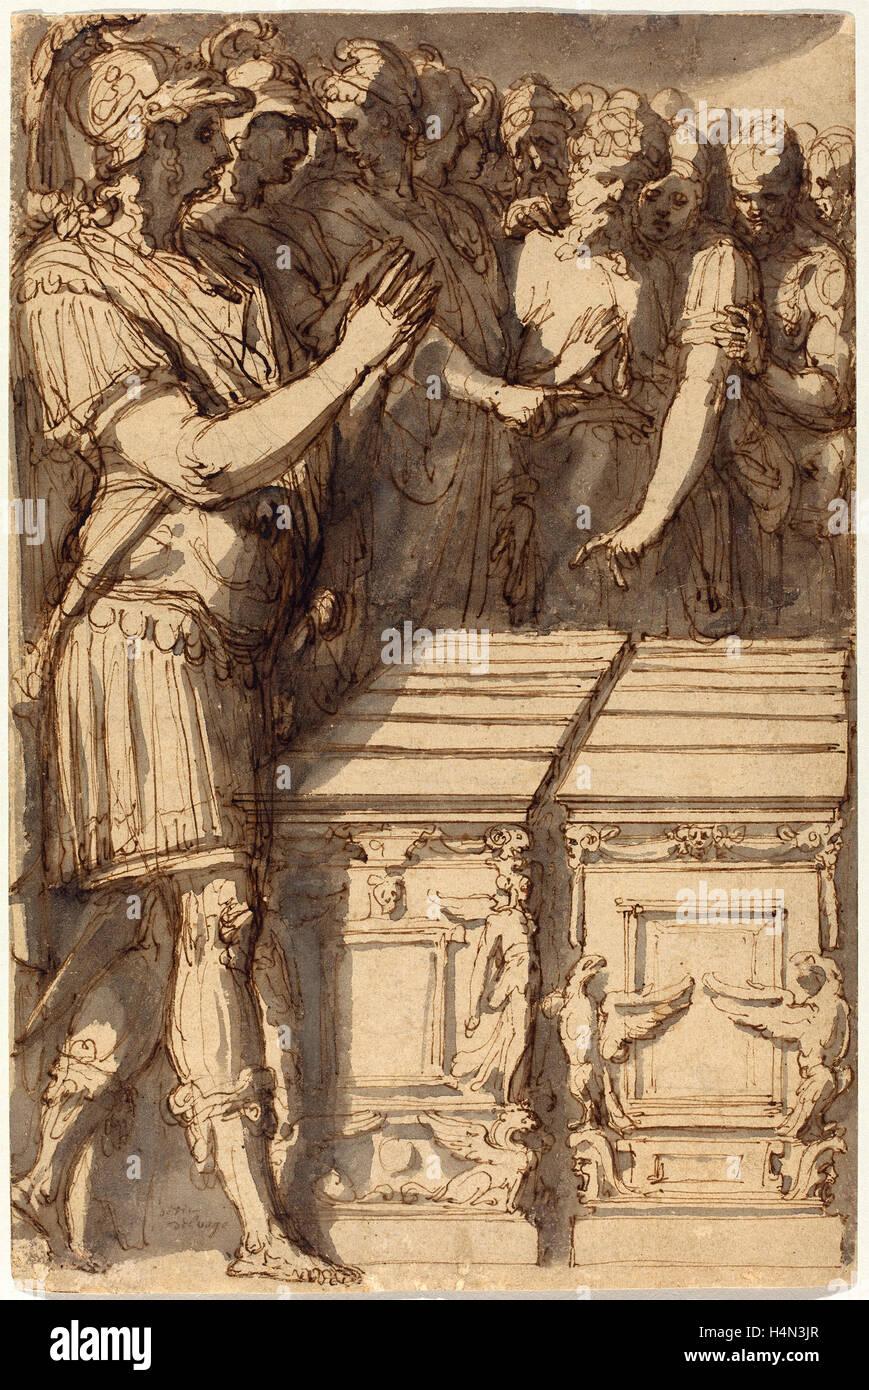 Perino del Vaga (Italian, 1501 - 1547), Alexander Consecrating the Altars  for the Twelve Olympian Gods, 1545-1547, pen